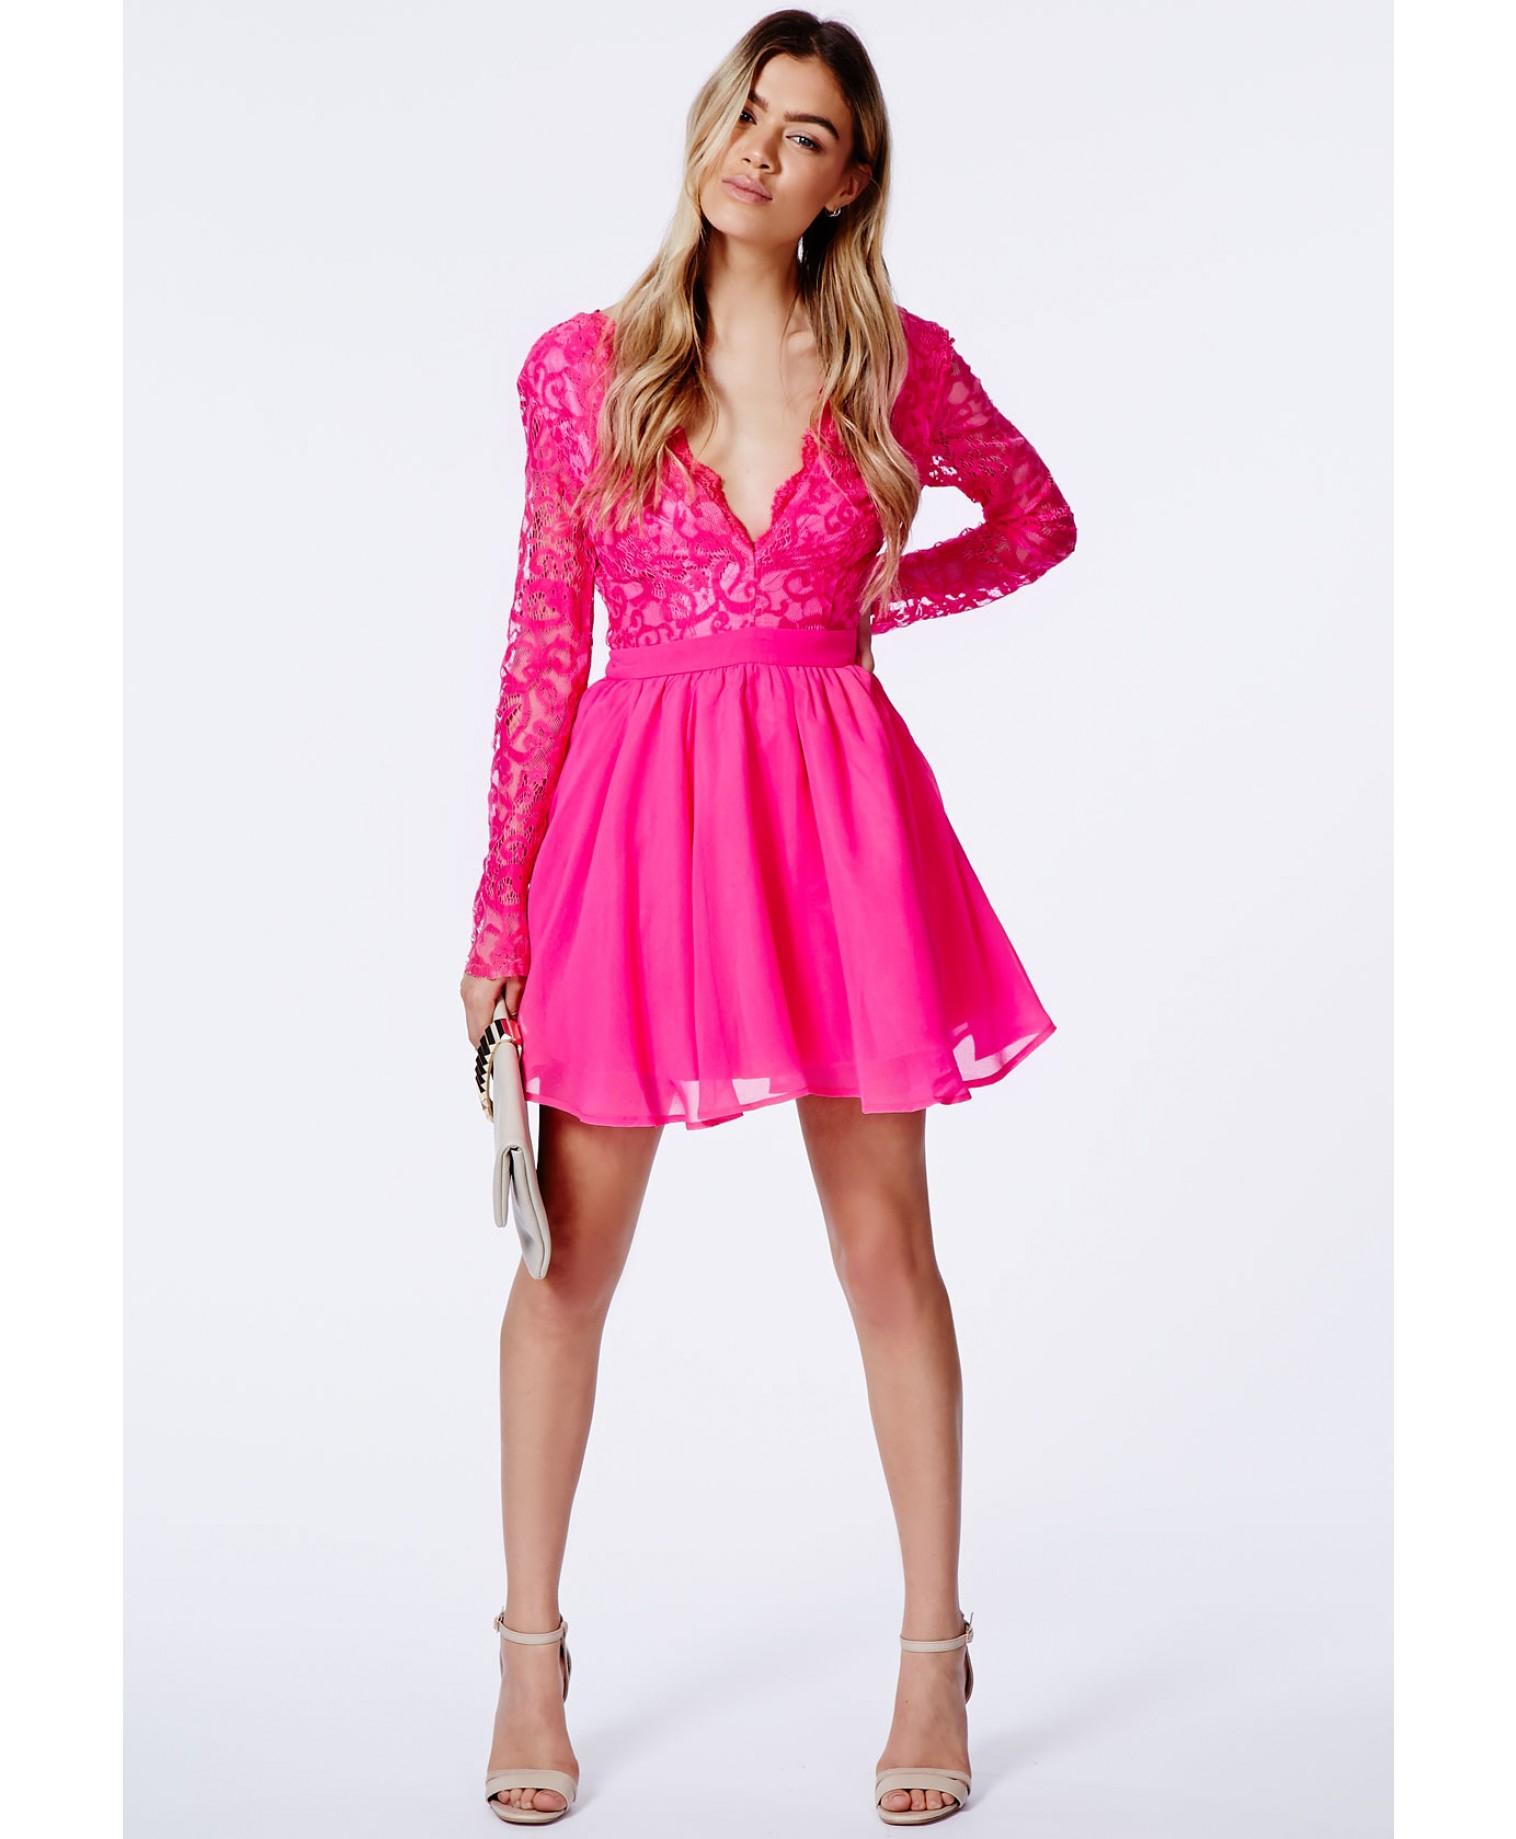 ball gowns Irvine